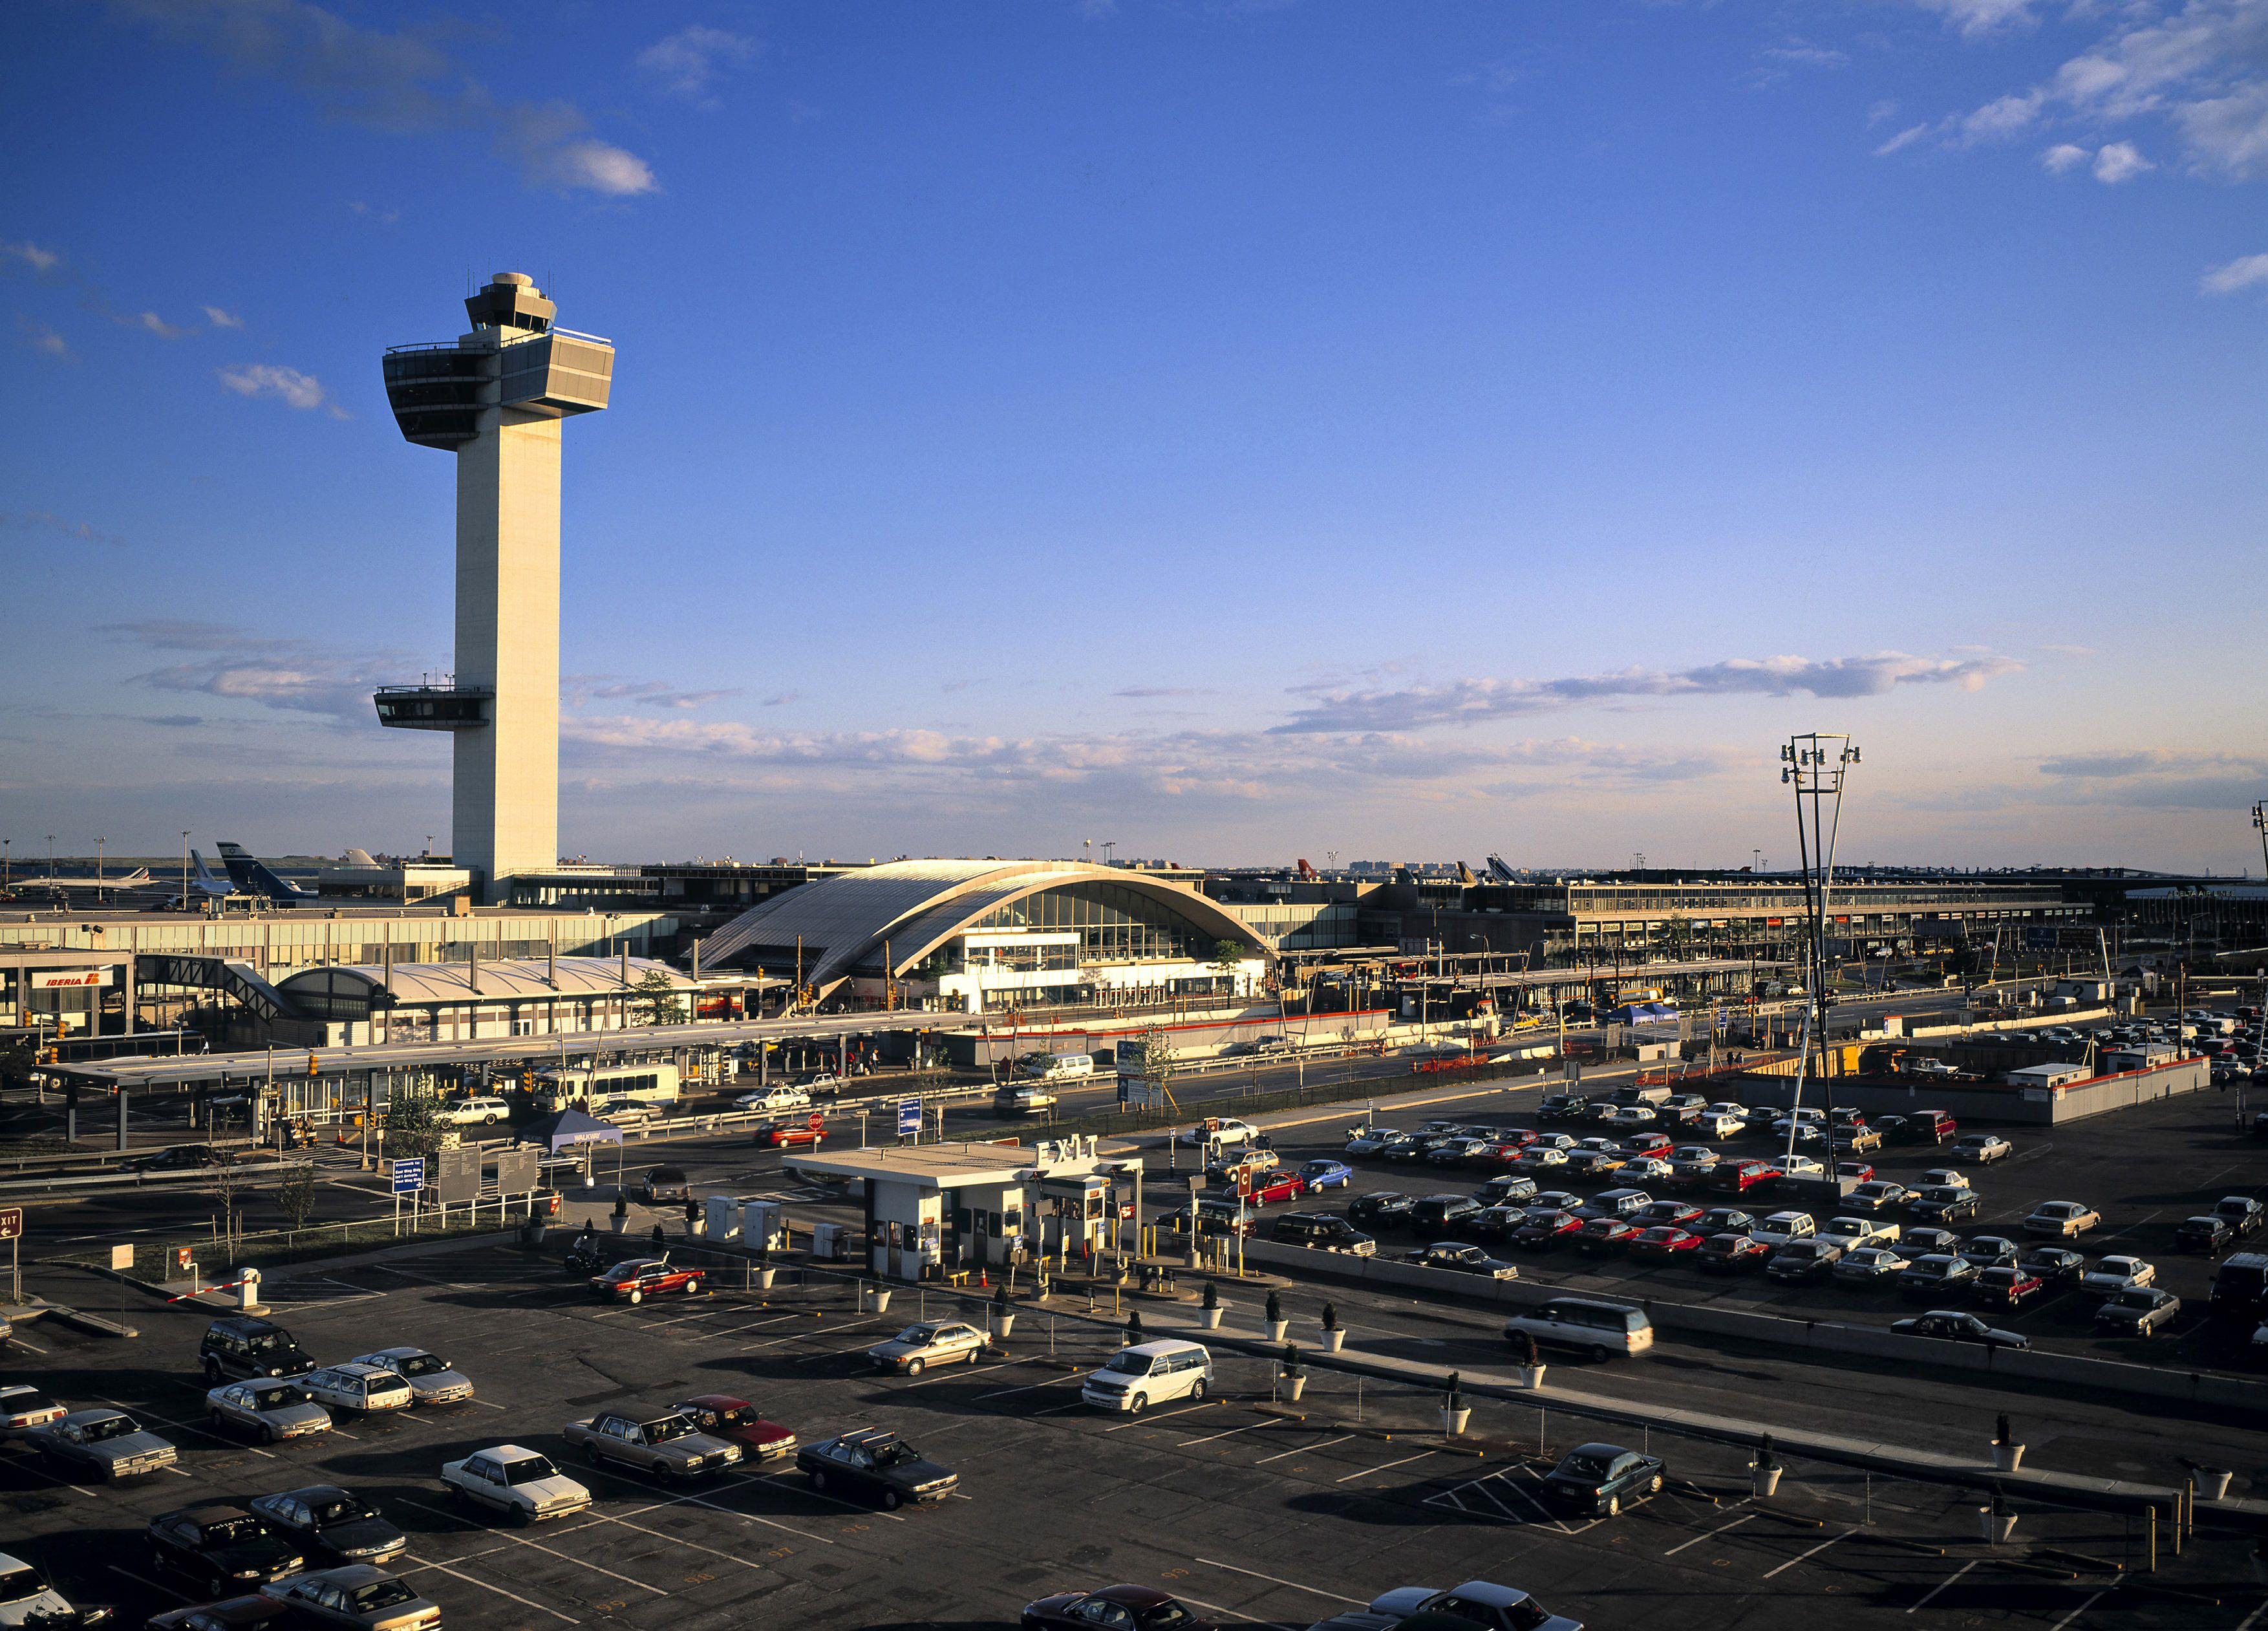 Laguardia airport valet parking